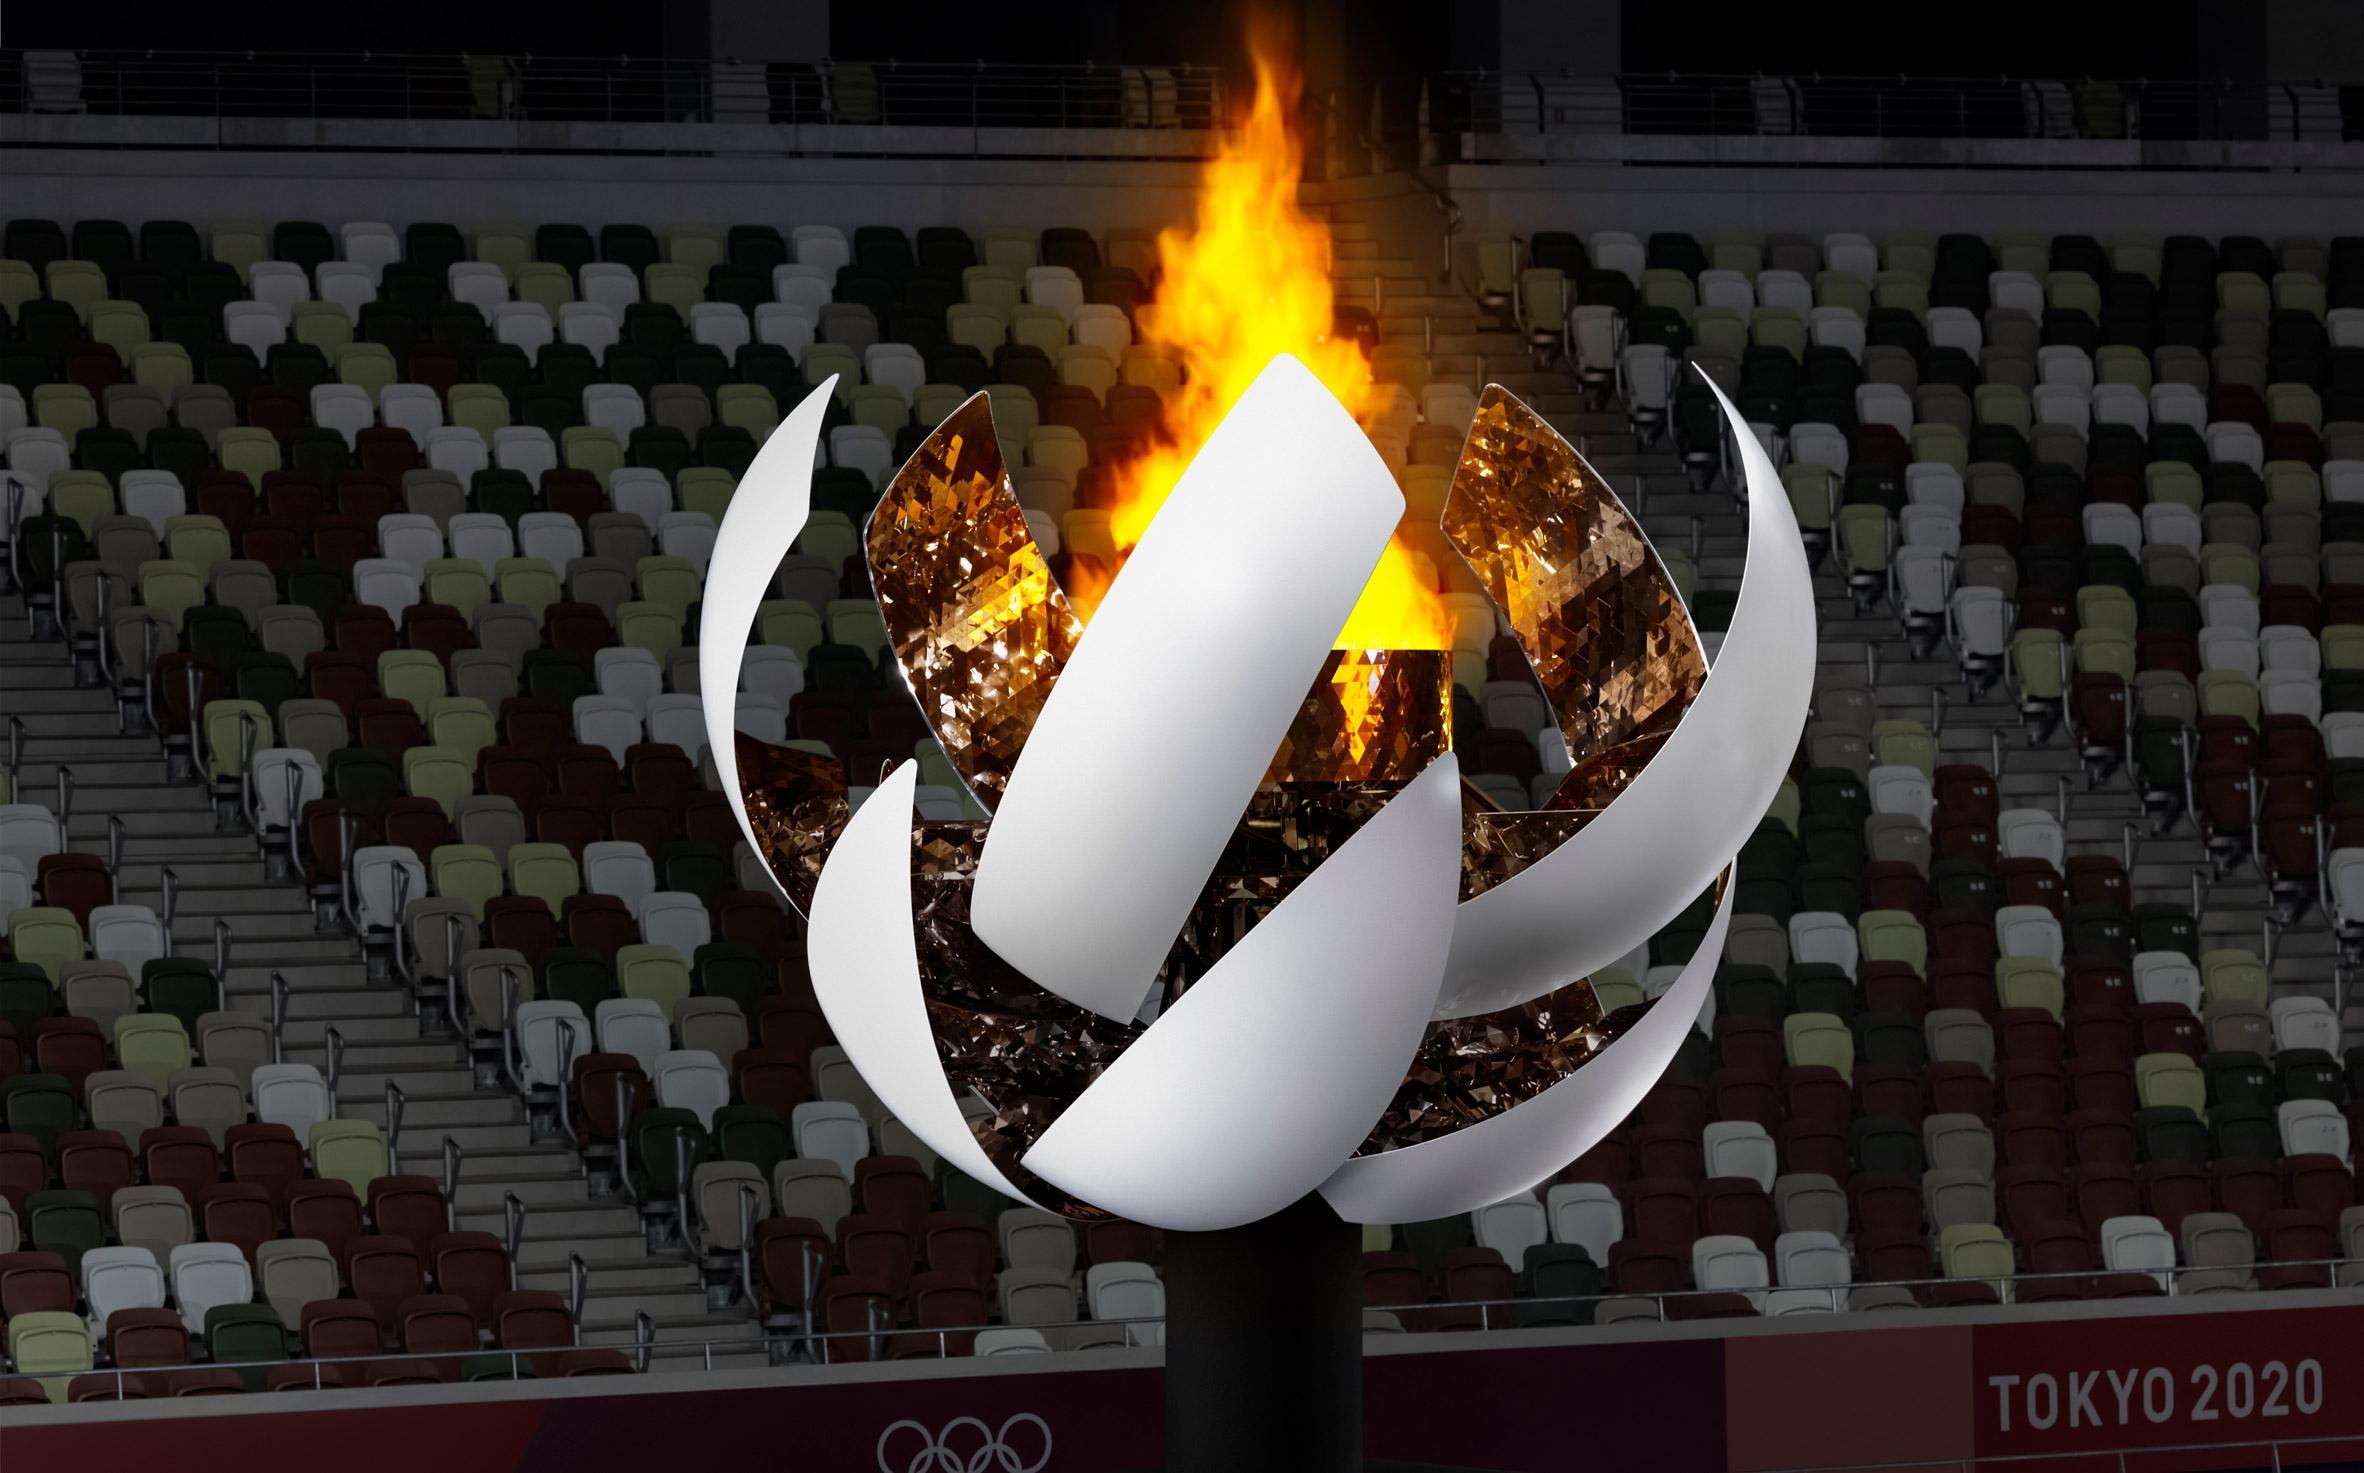 Tokyo 2020 Olympic cauldron